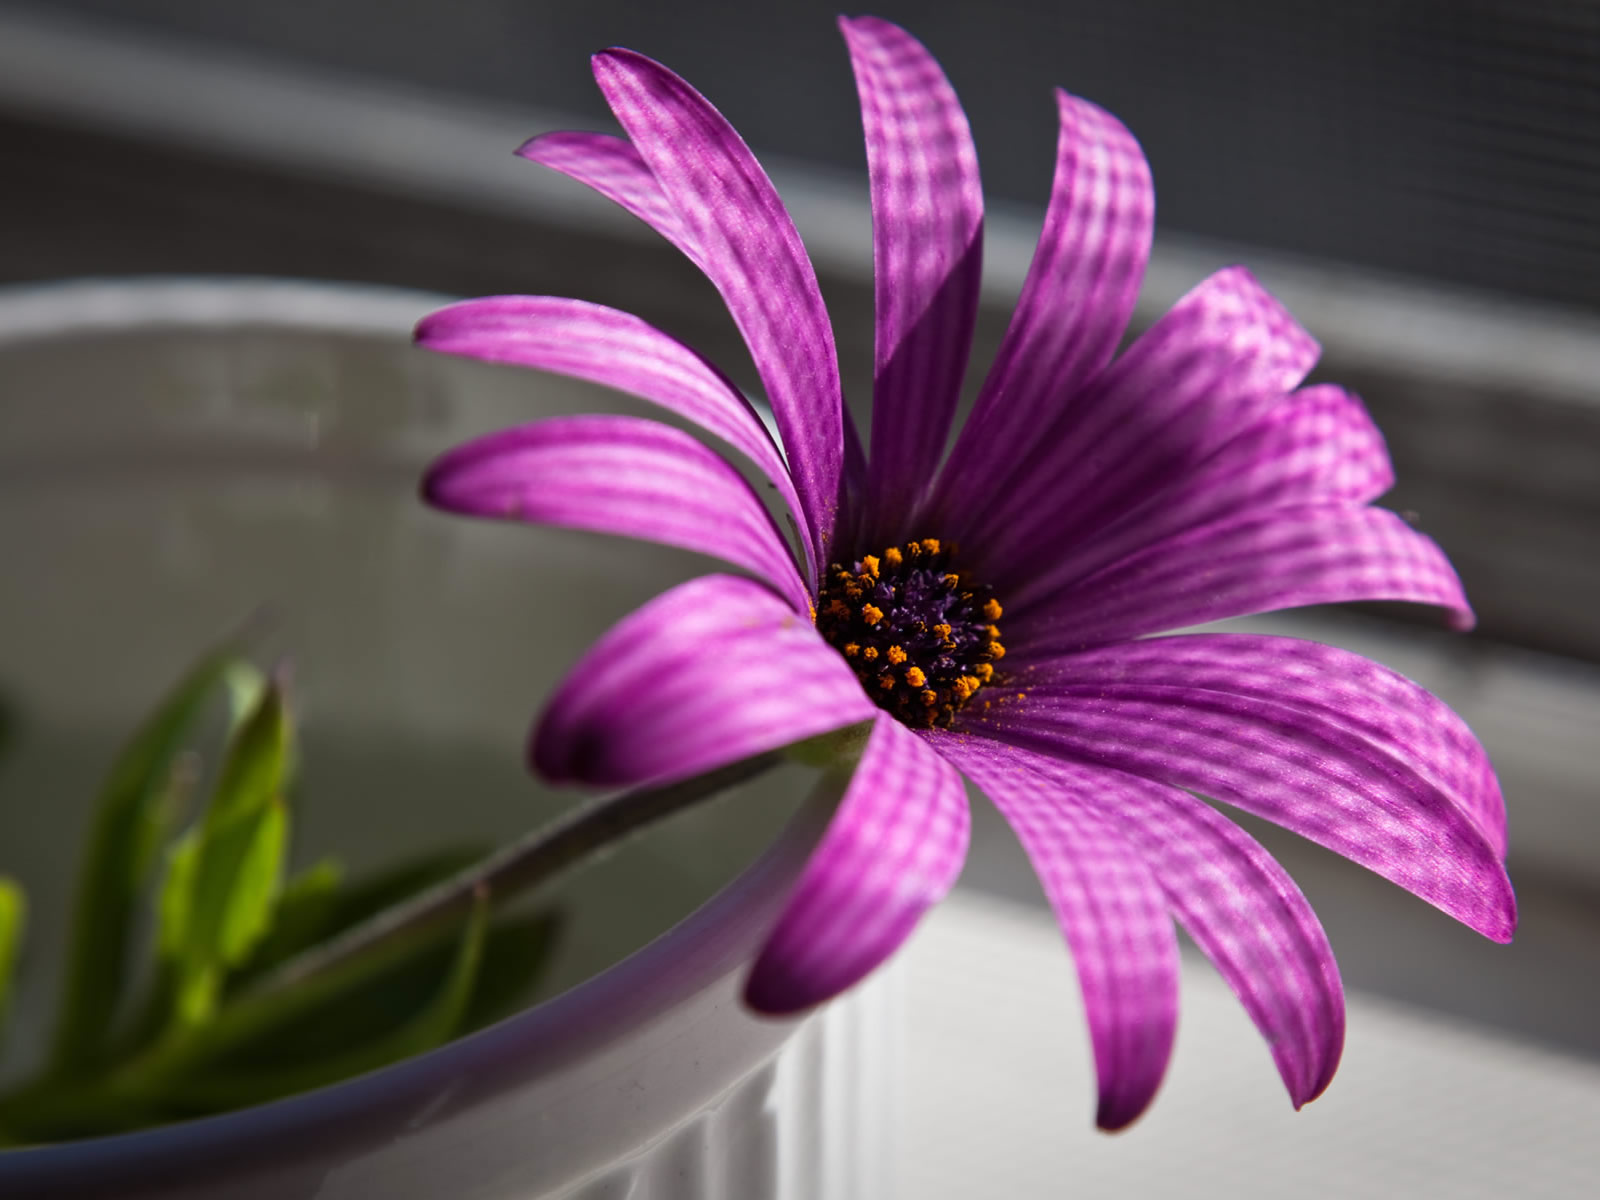 flowers for flower lovers Desk top HD Beautiful flowers wallpapers 1600x1200